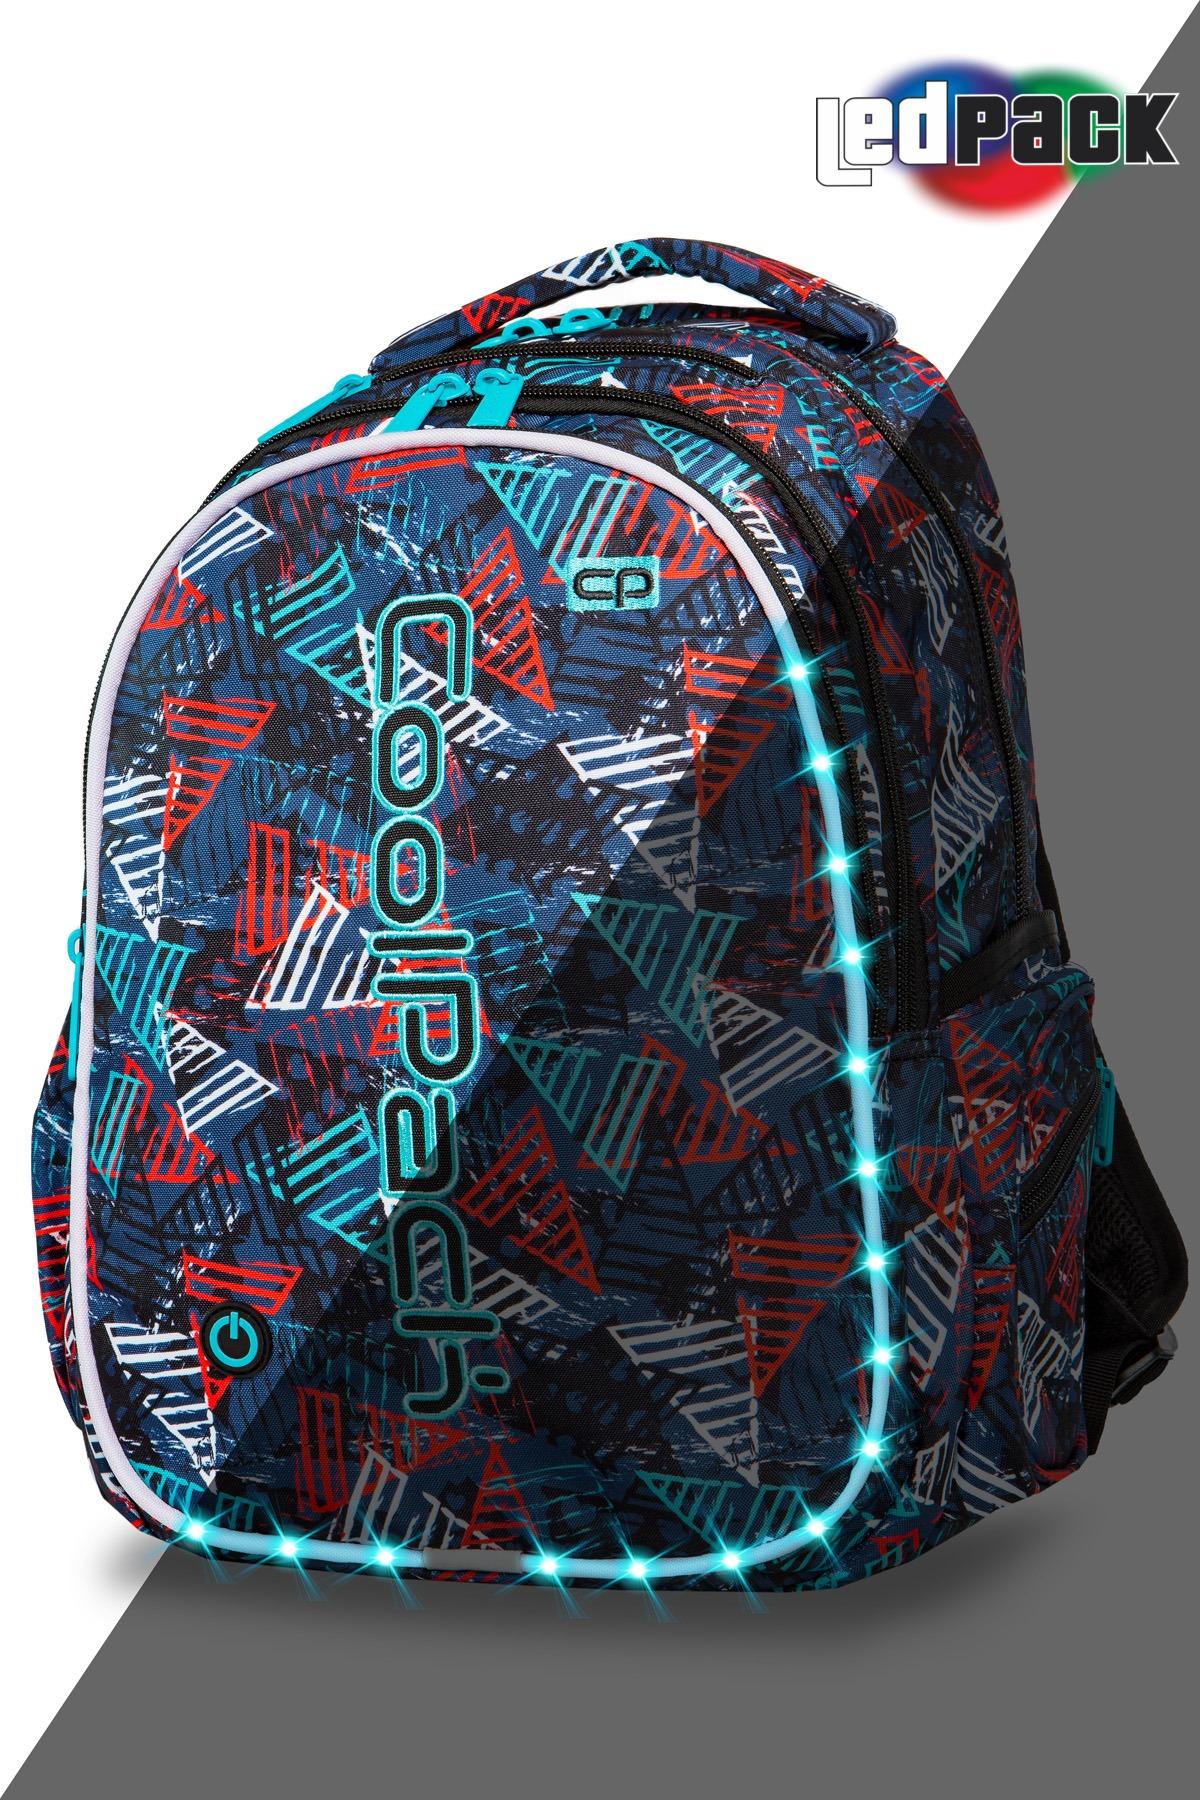 Coolpack   joy l  rygsæk   led triangles